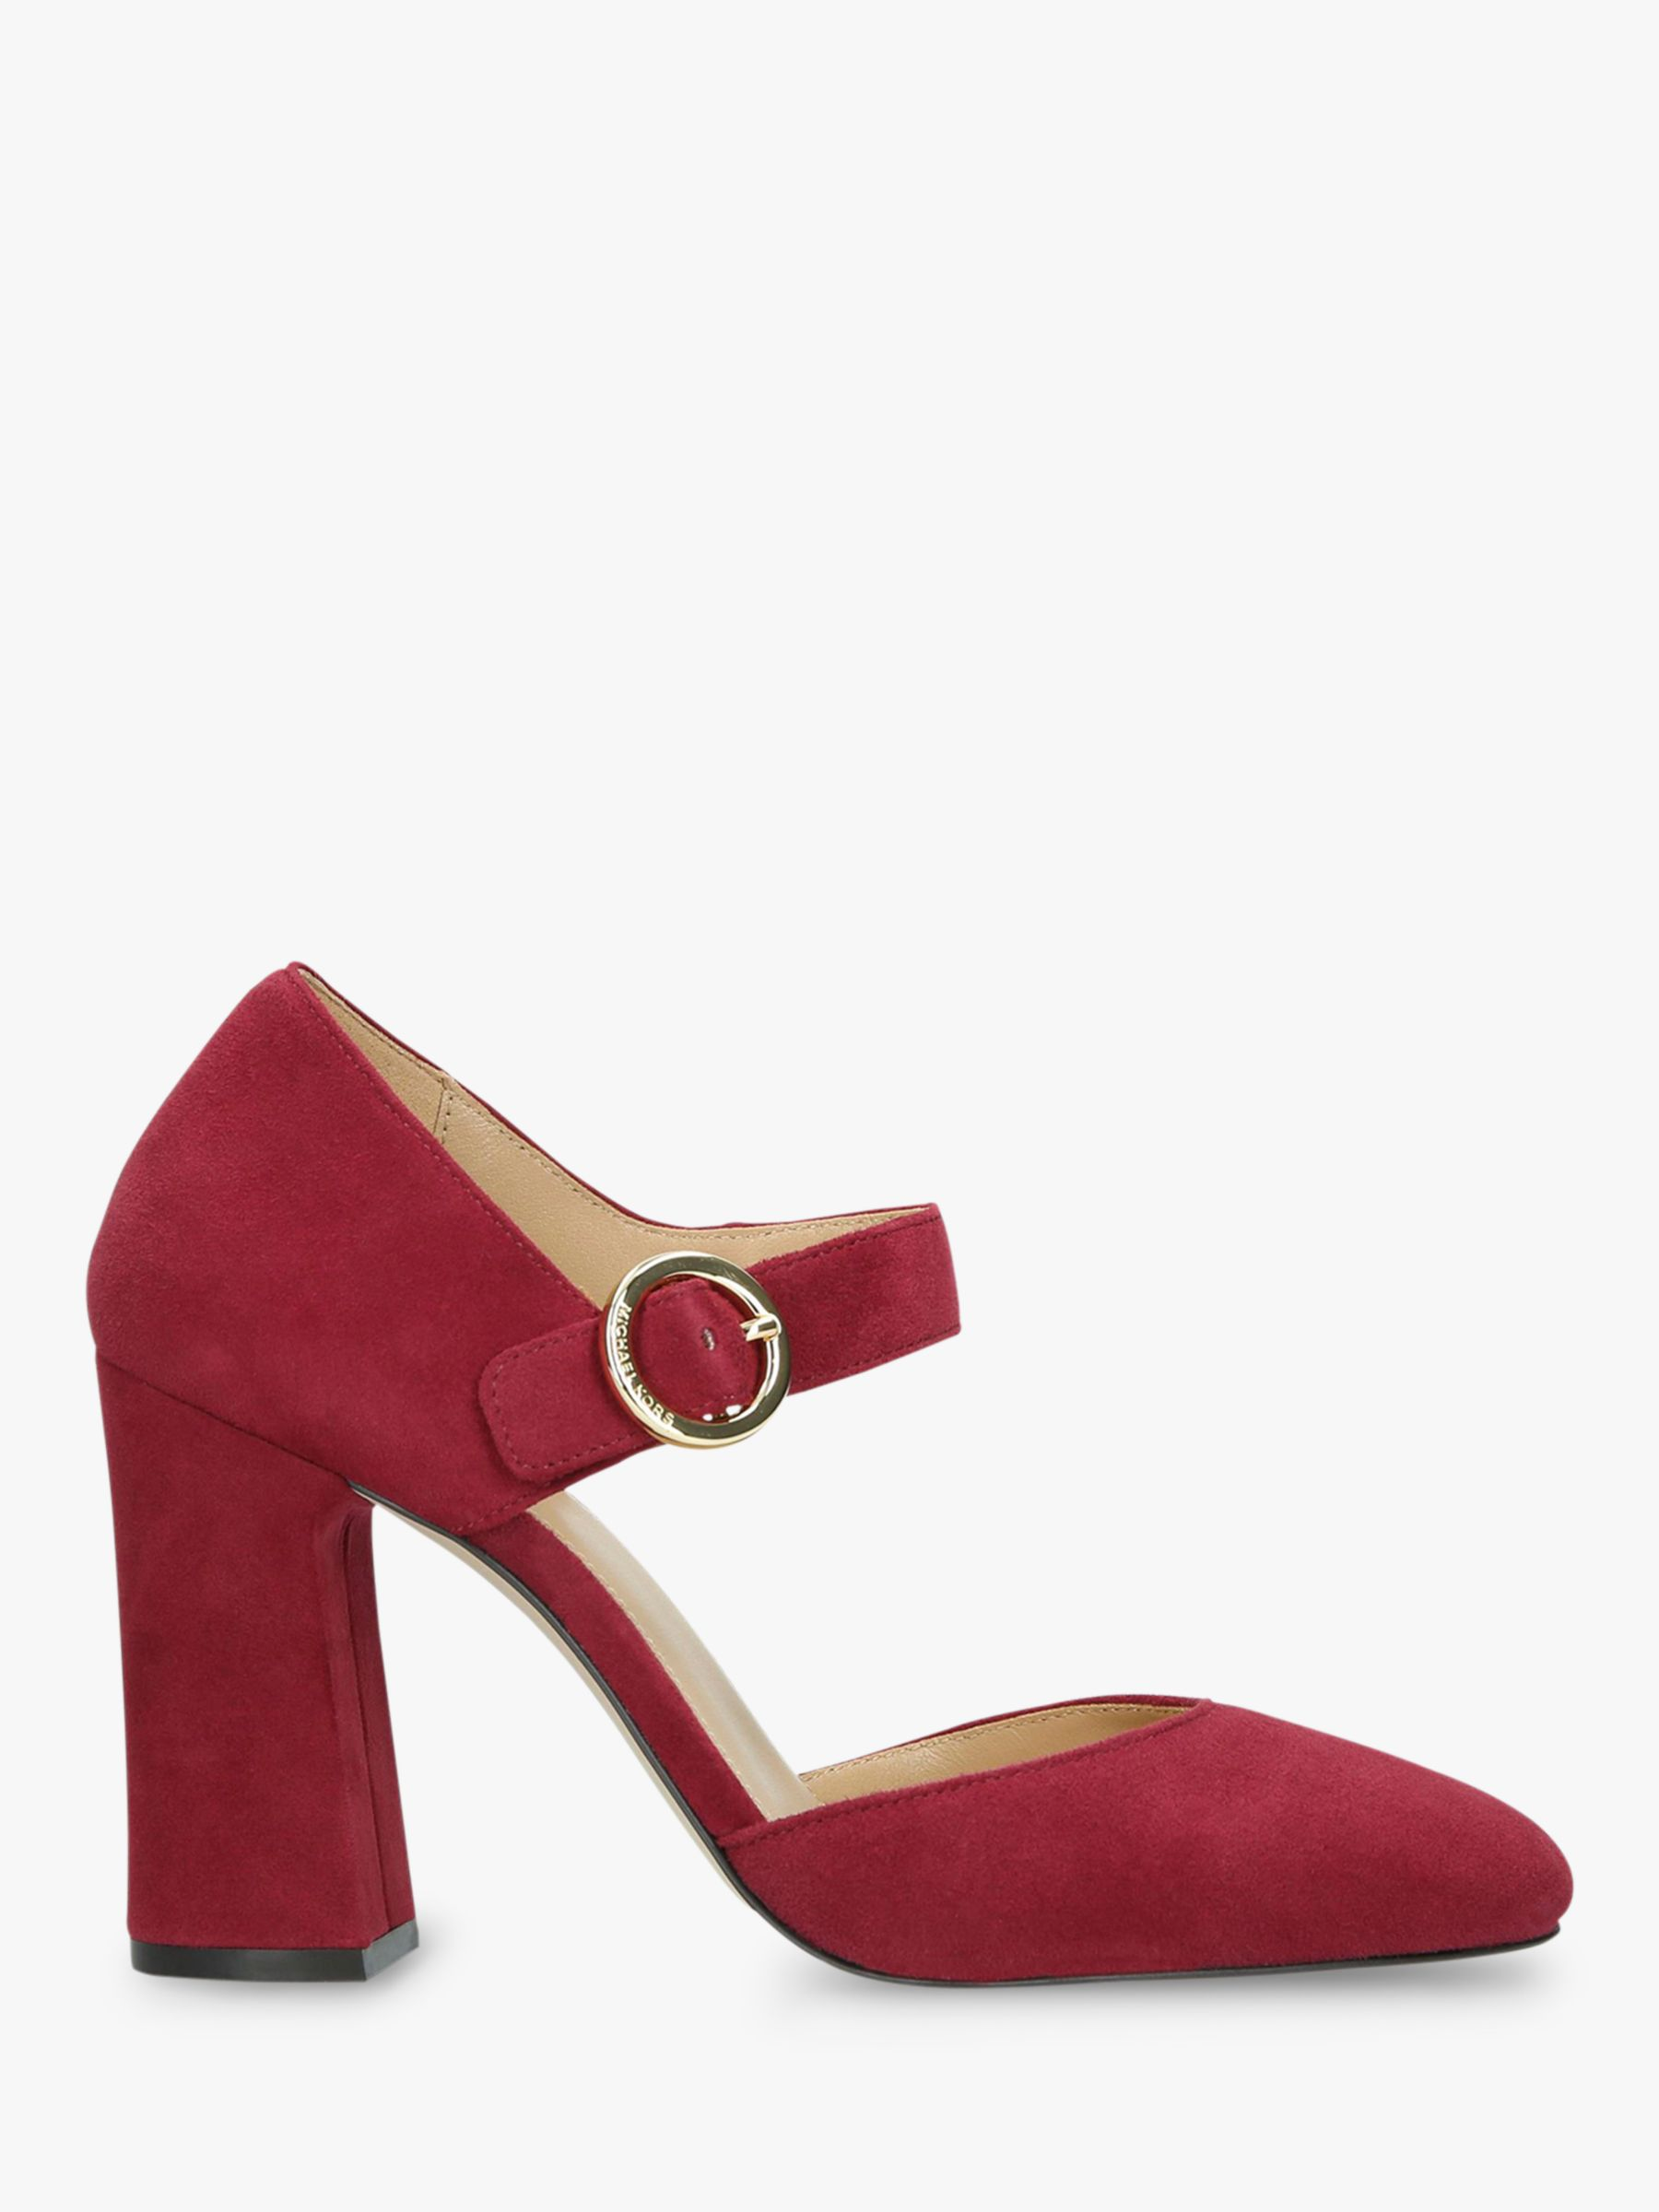 2adef124887d8 MICHAEL Michael Kors Alana Block Heel Mary Jane Court Shoes at John Lewis    Partners